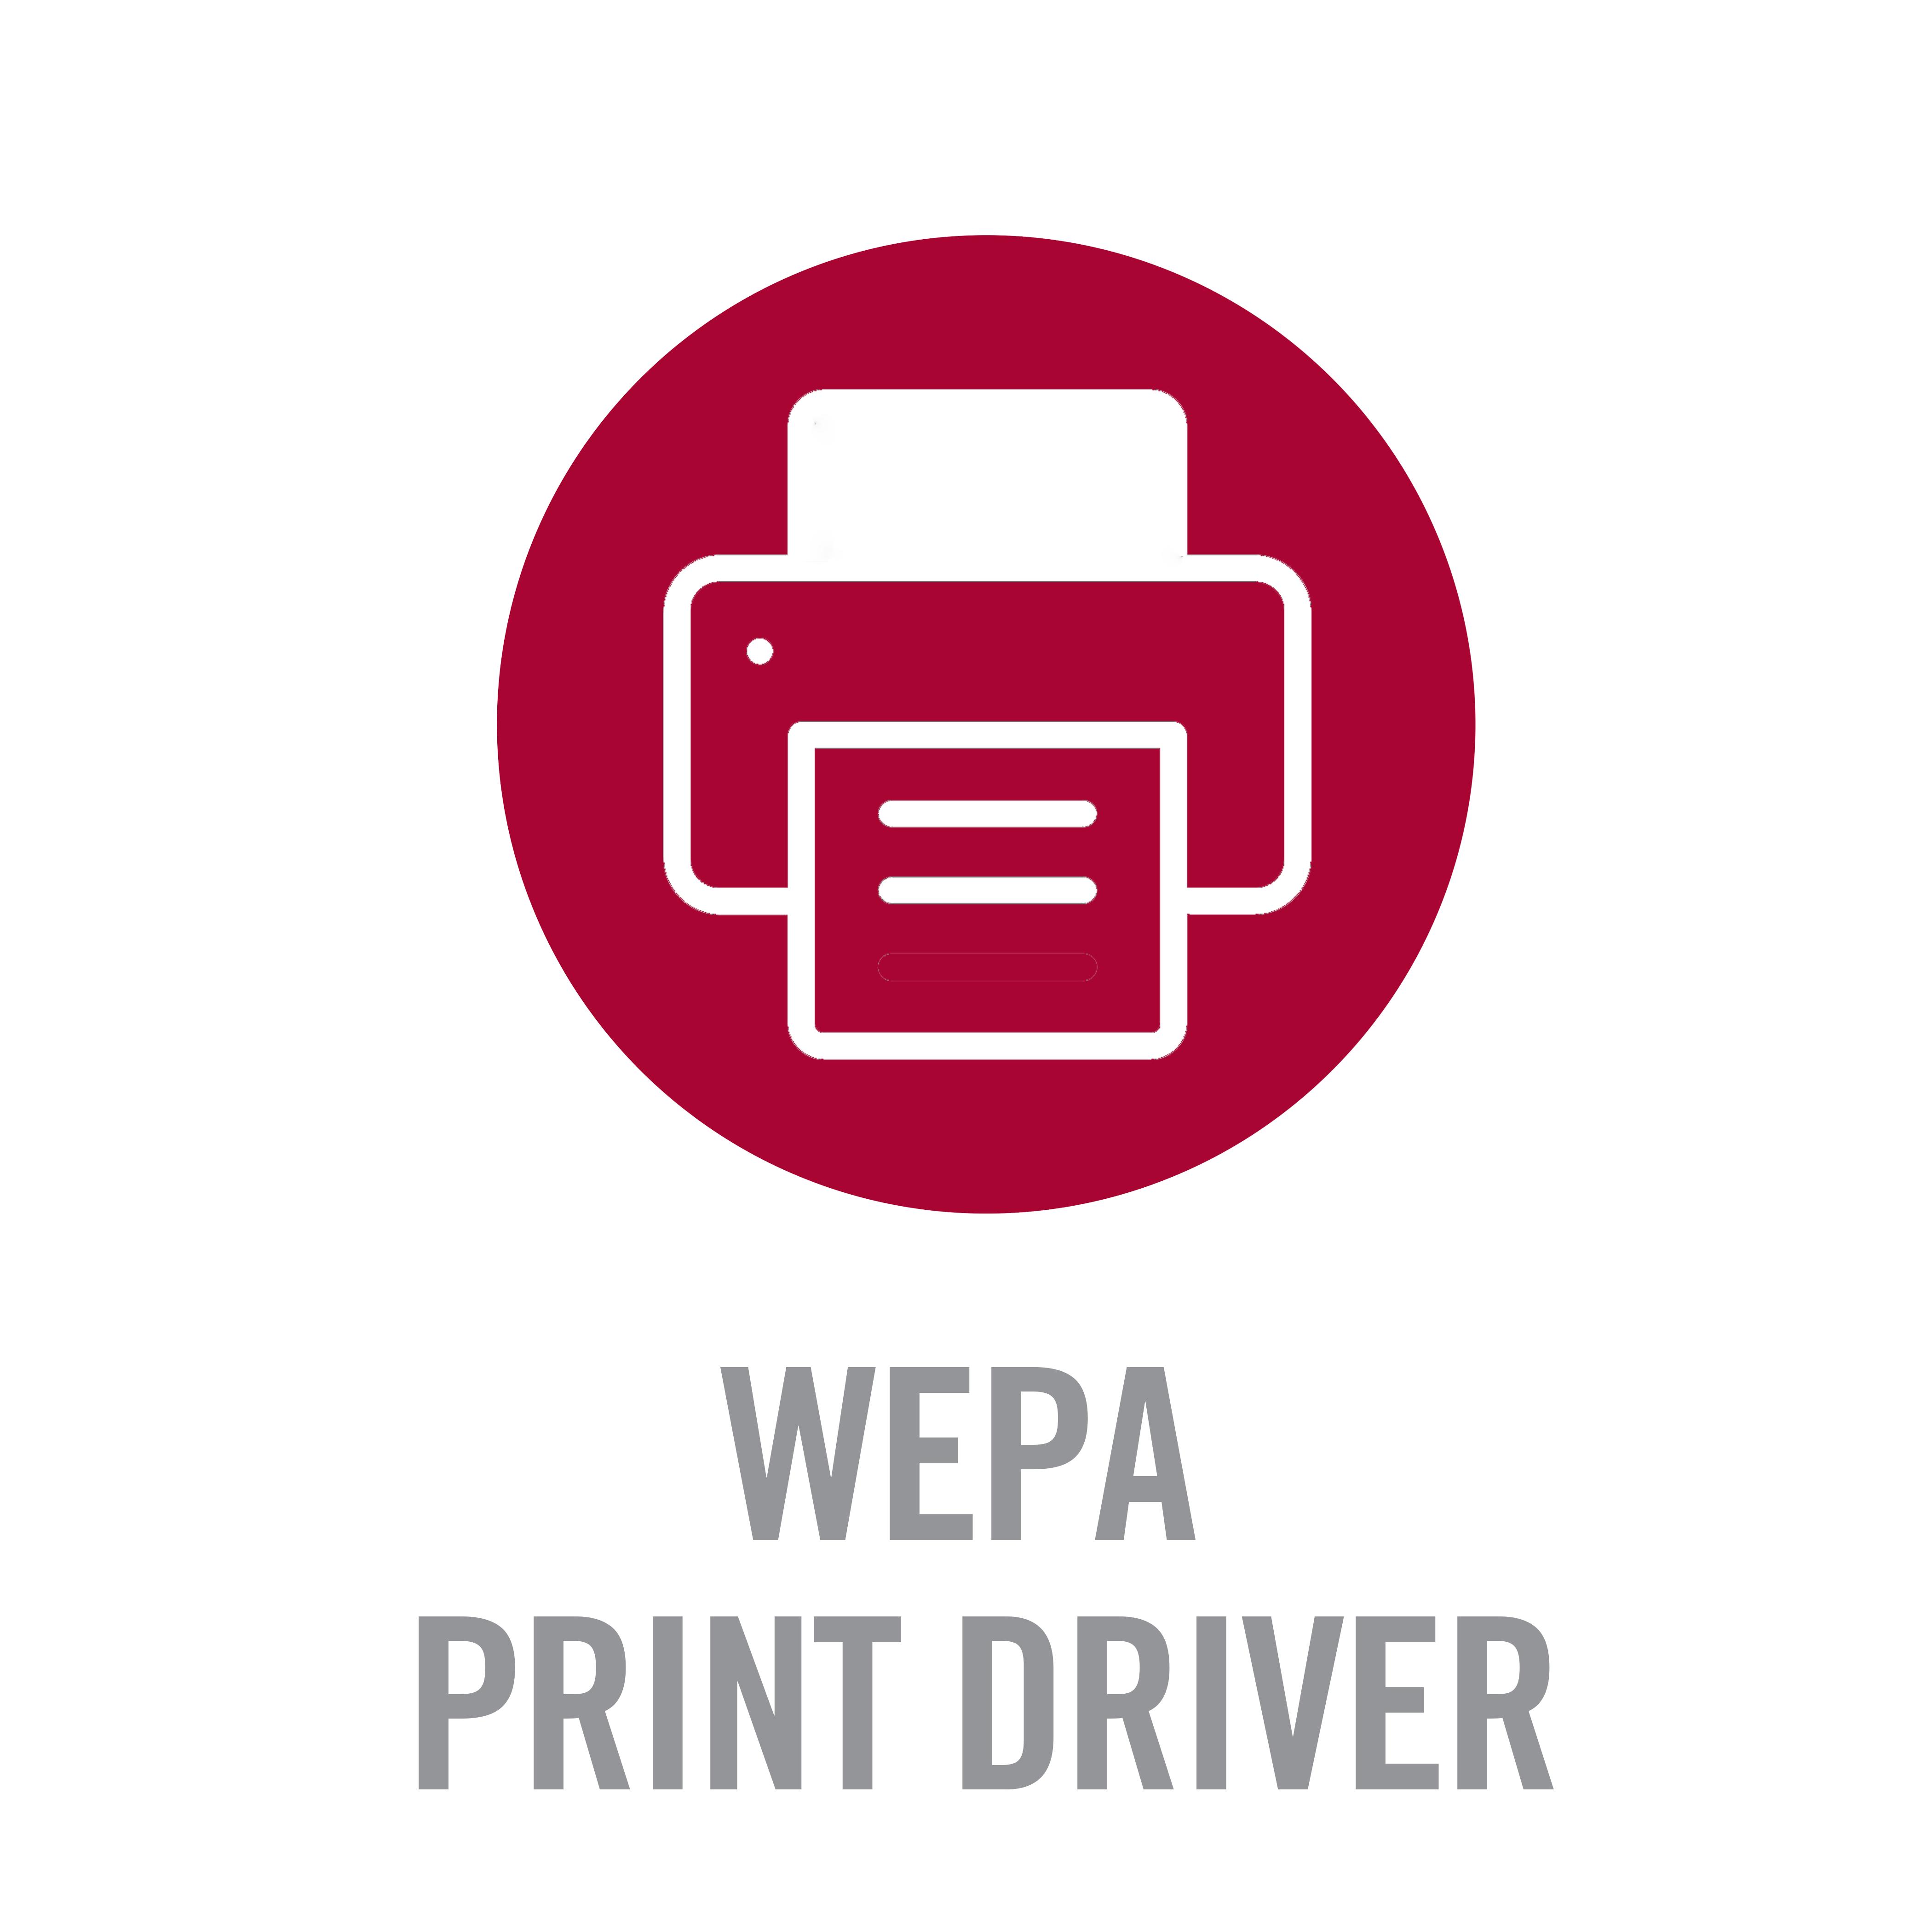 Wepa Print Driver